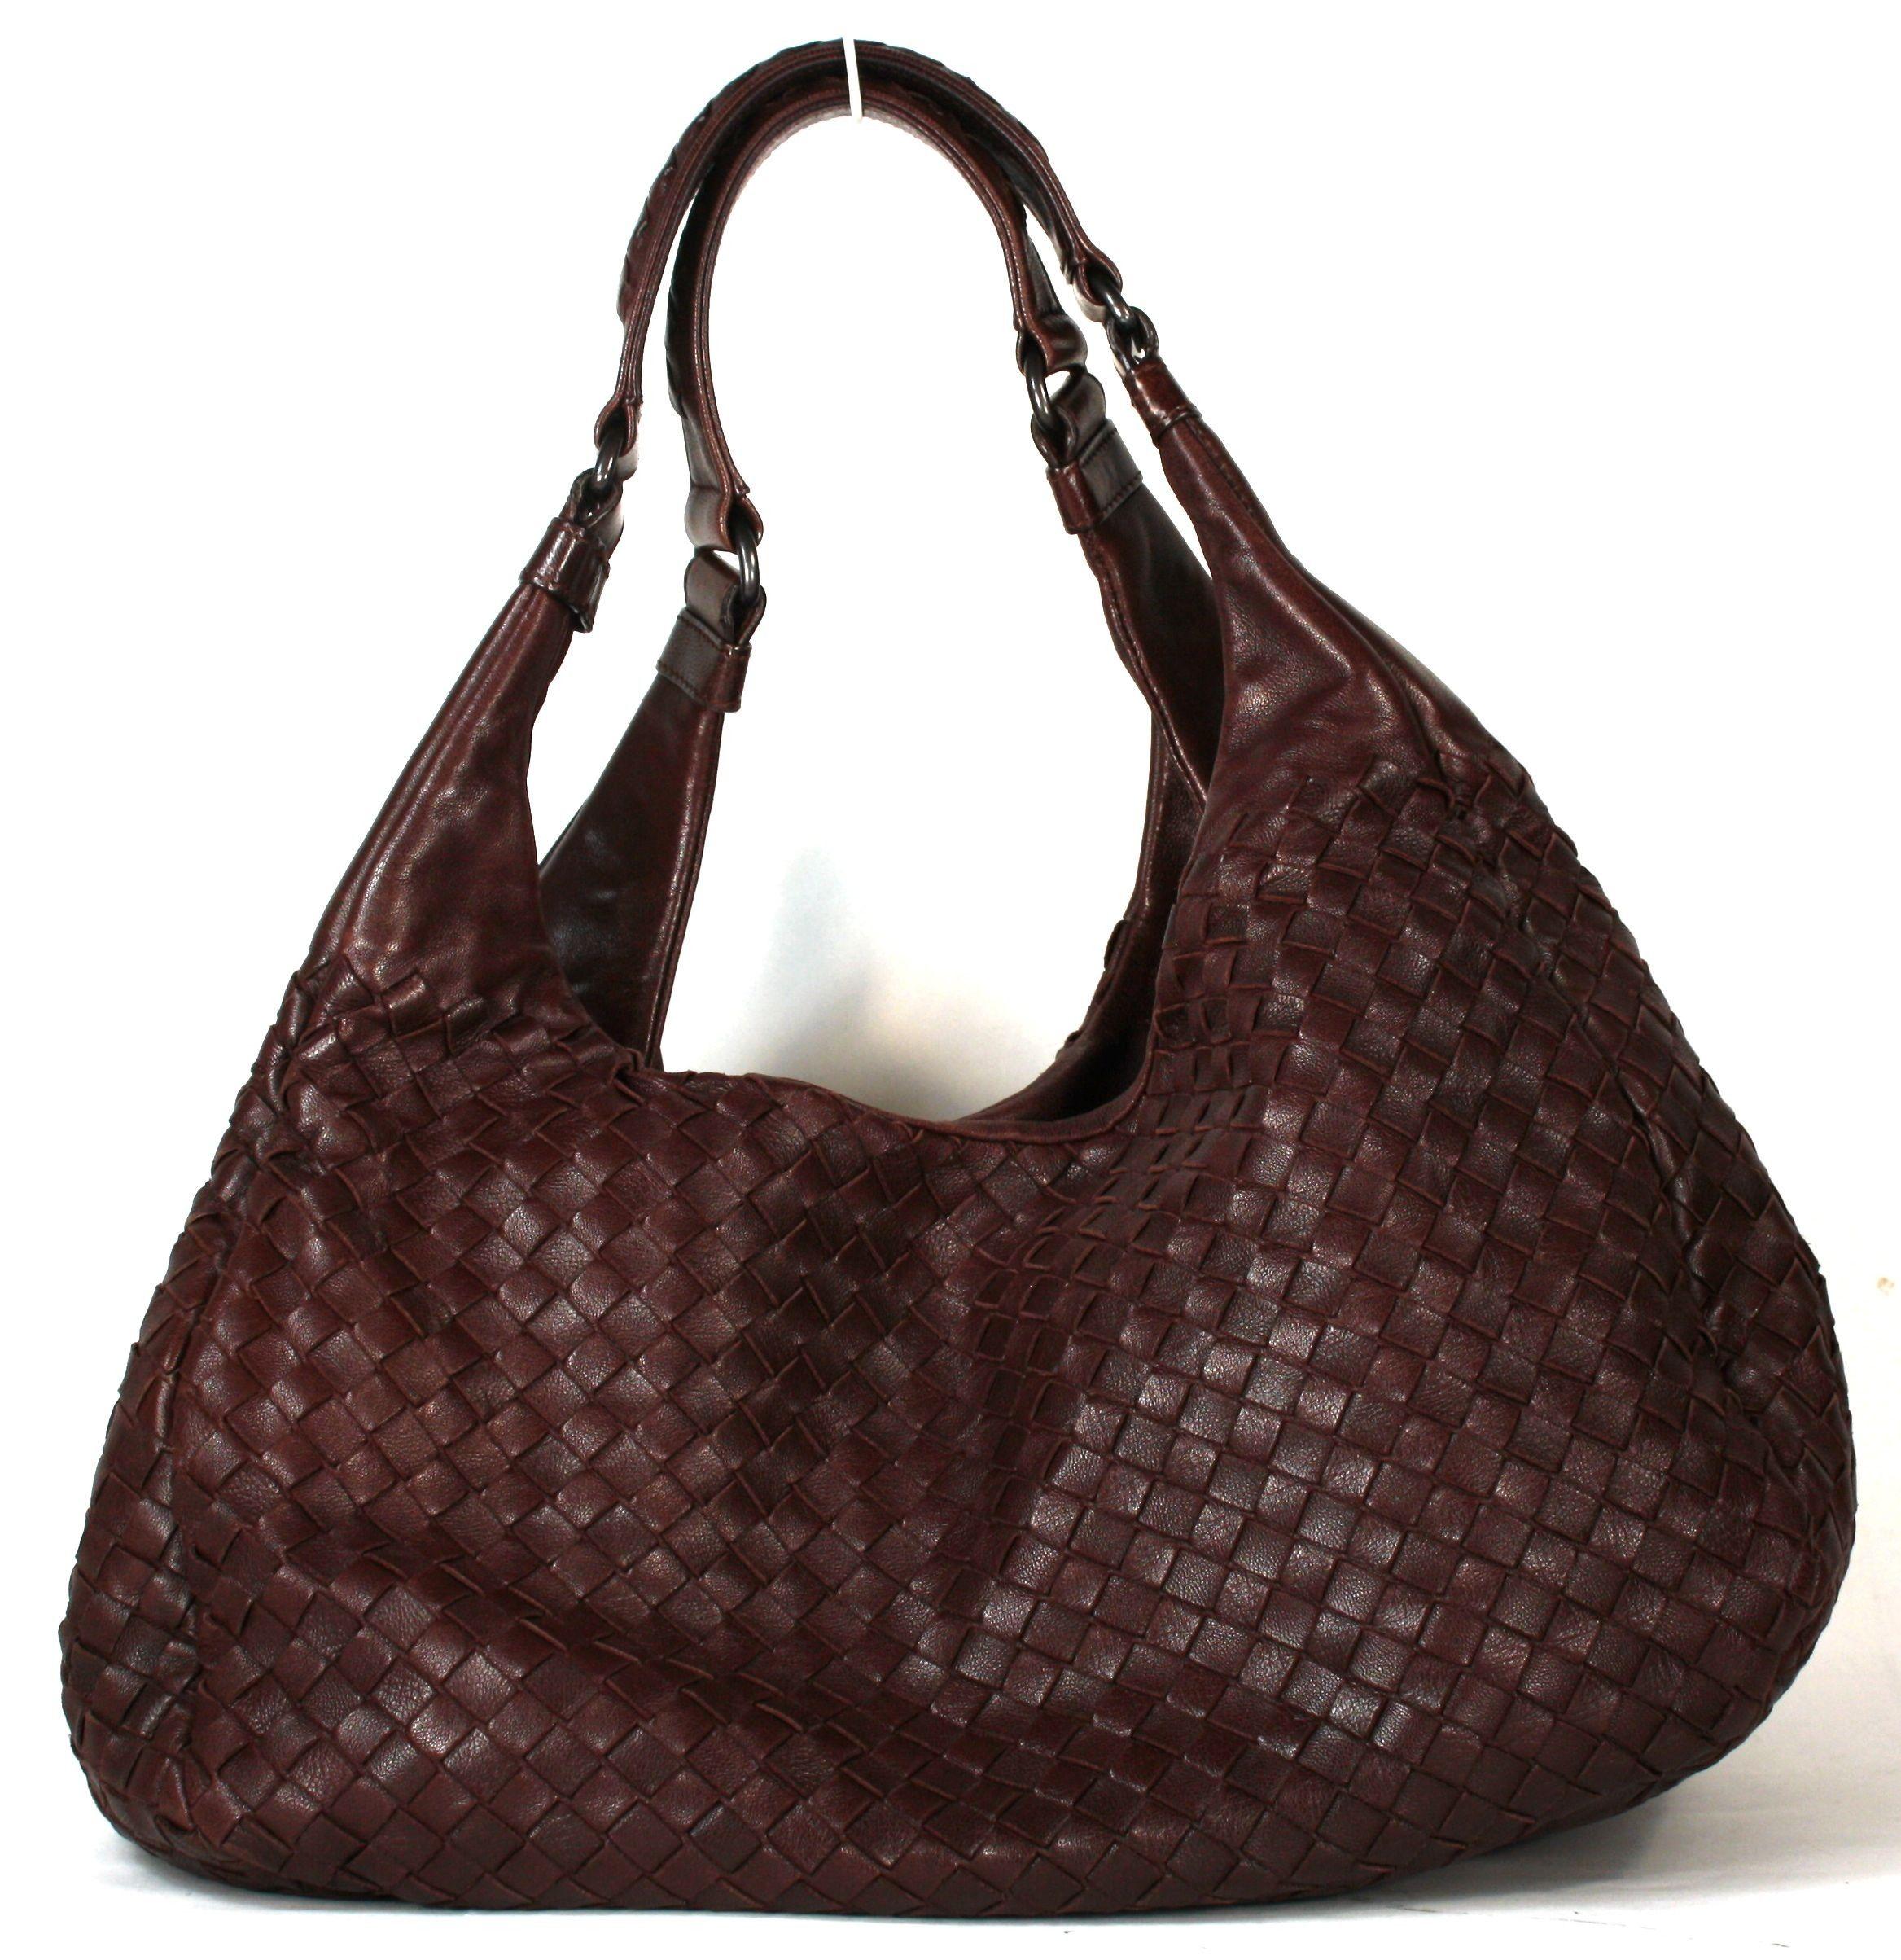 Bottega Veneta Dark Brown Woven Leather Hobo Bag Layaway Available Review Now